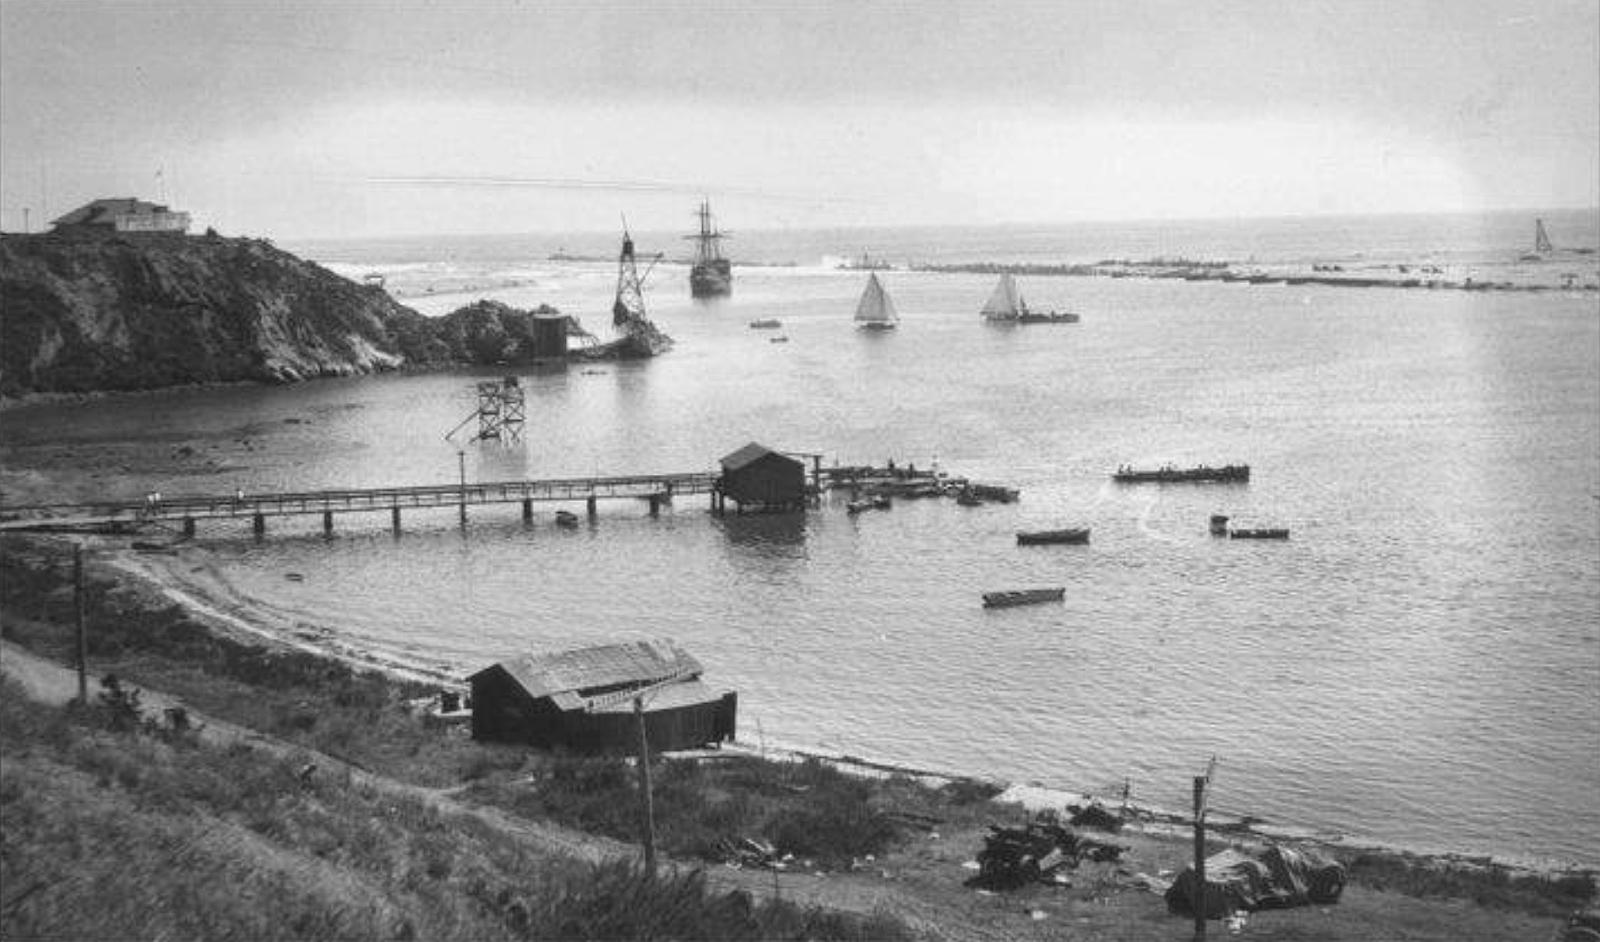 The white apron newport beach - Newport Harbor Entrance C 1900